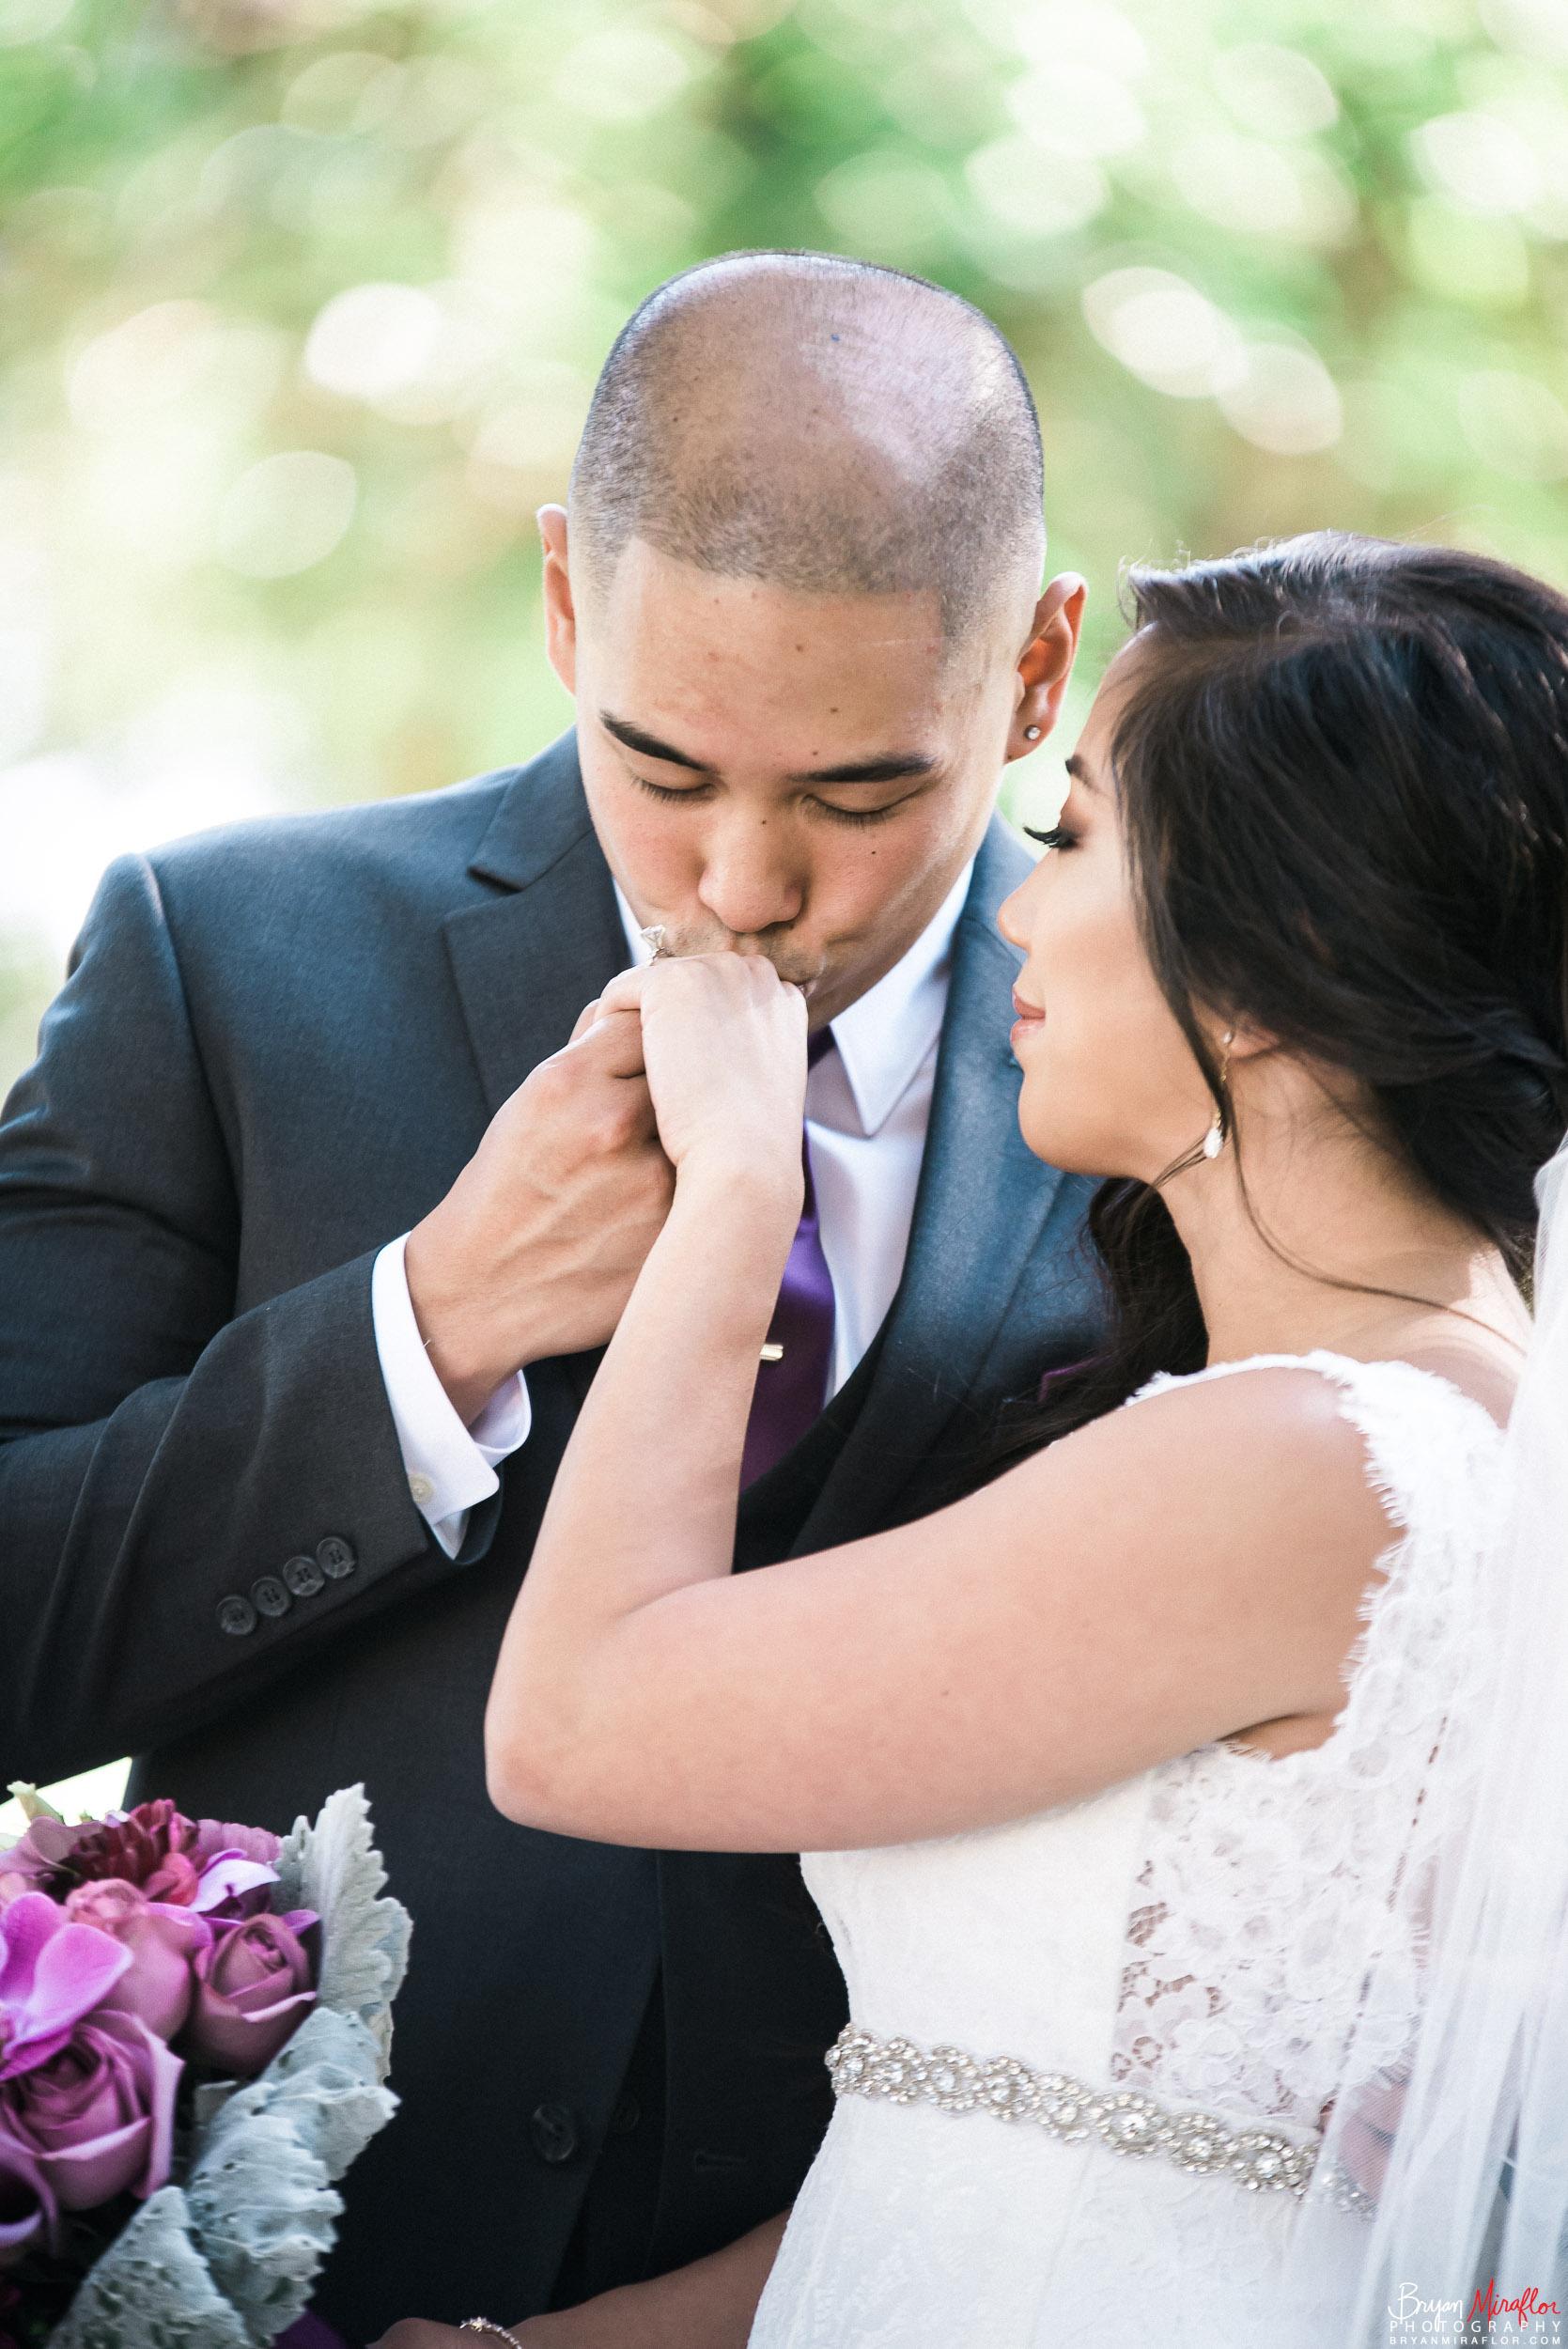 Bryan-Miraflor-Photography-Trisha-Dexter-Married-20170923-039.jpg